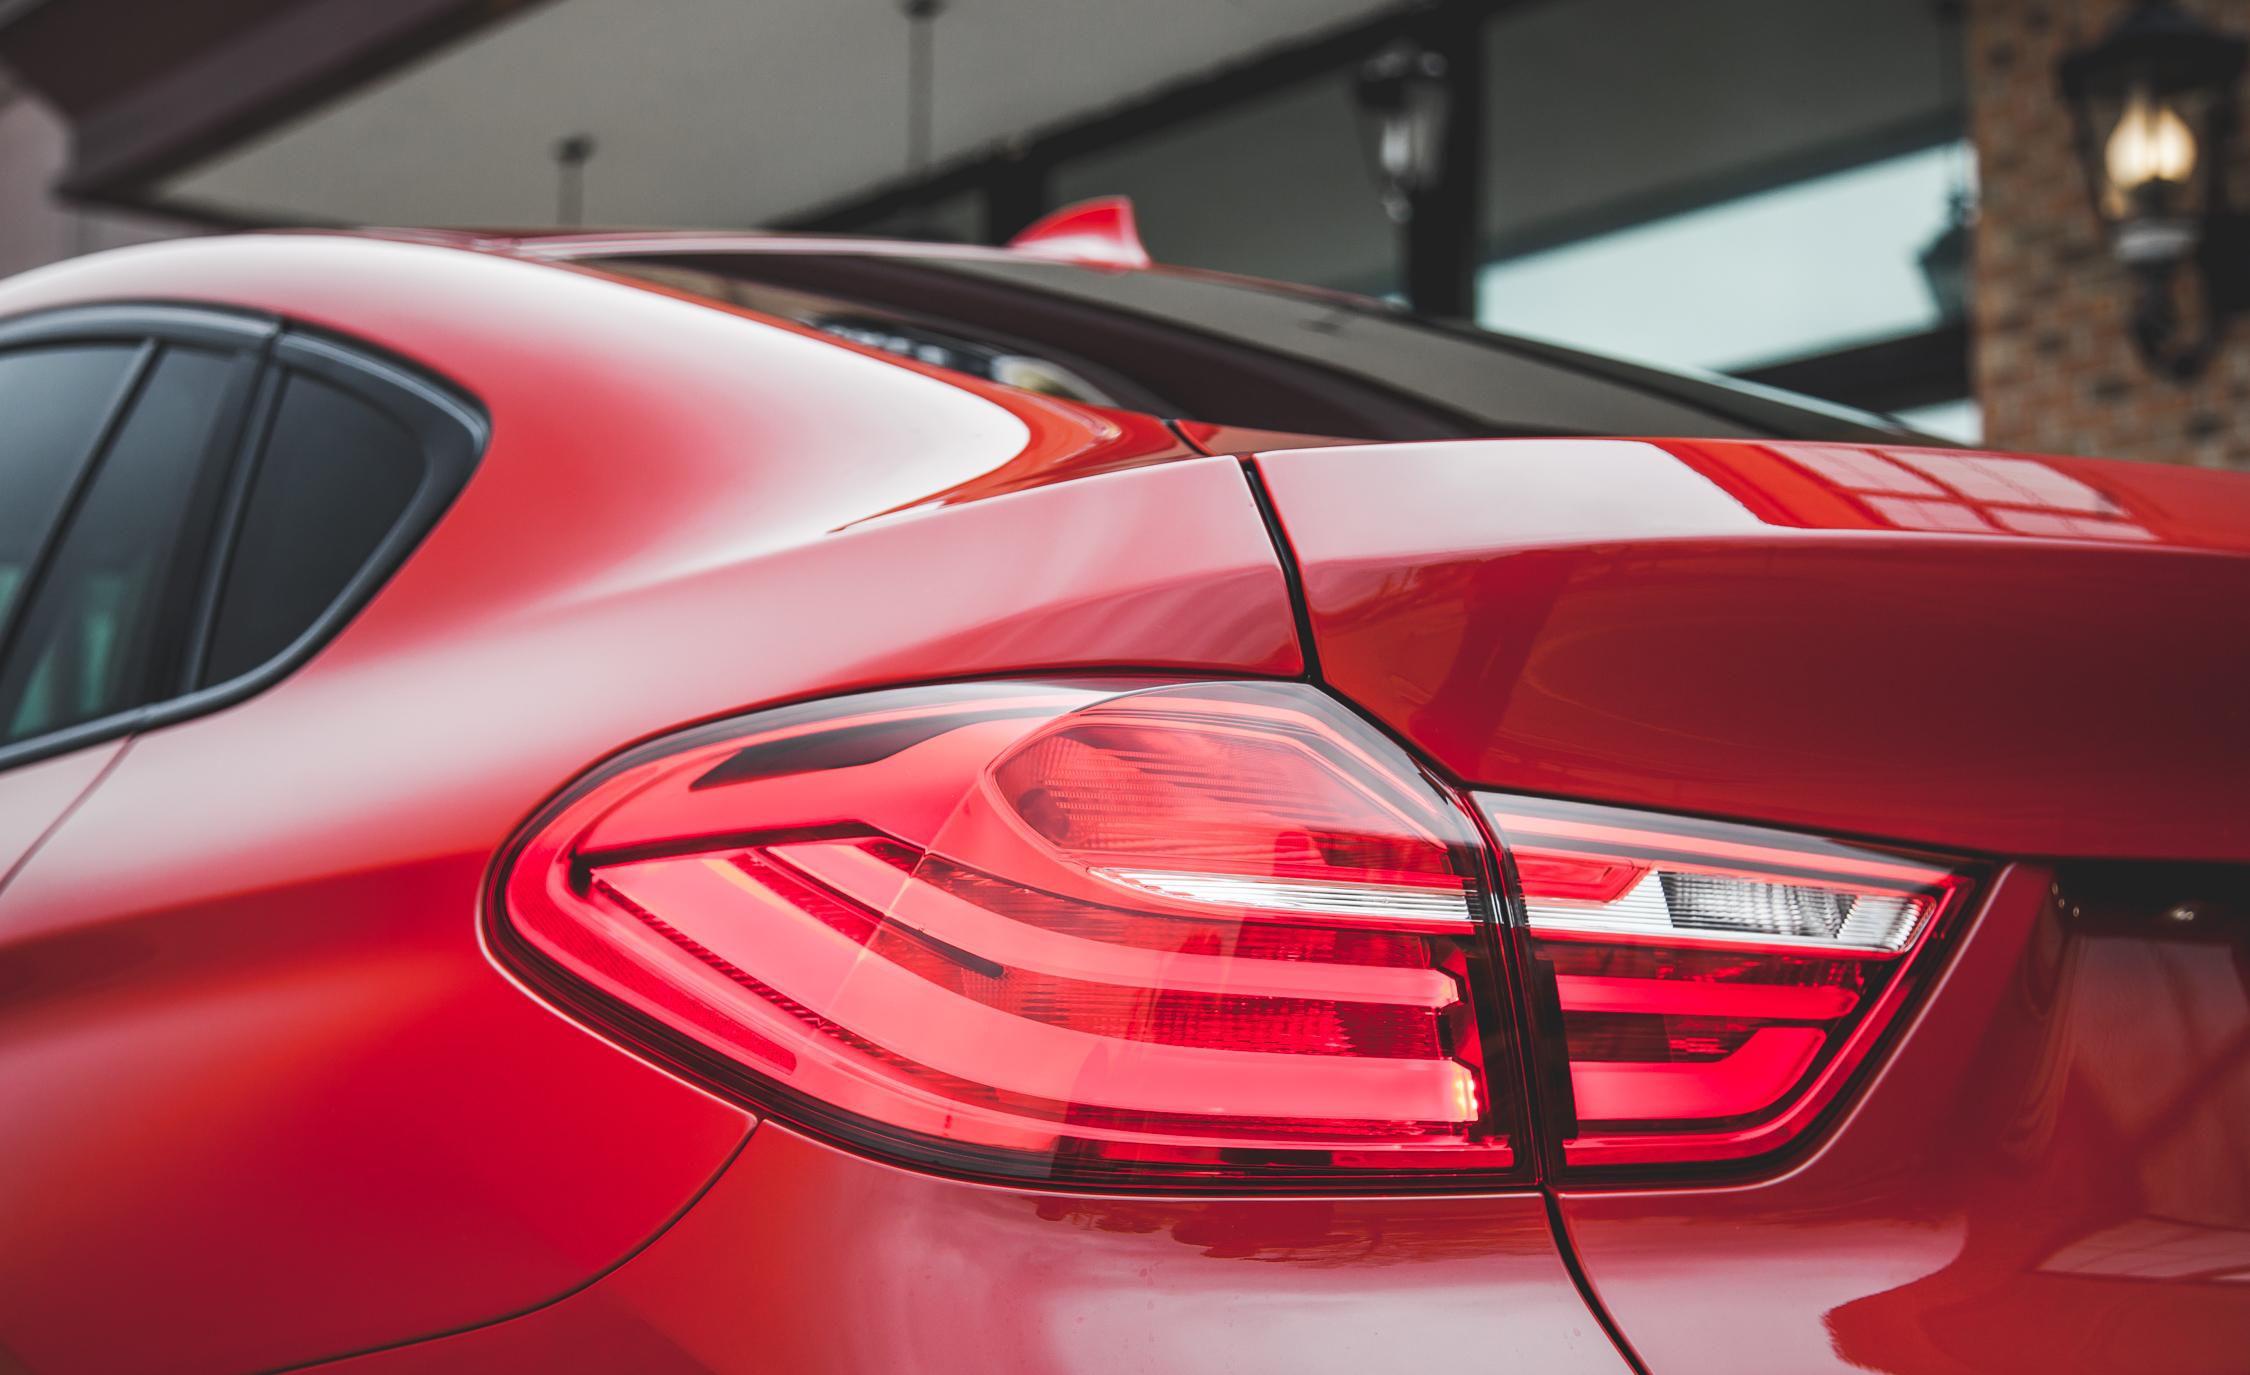 2015 BMW X4 xDrive28i Exterior Taillight Left